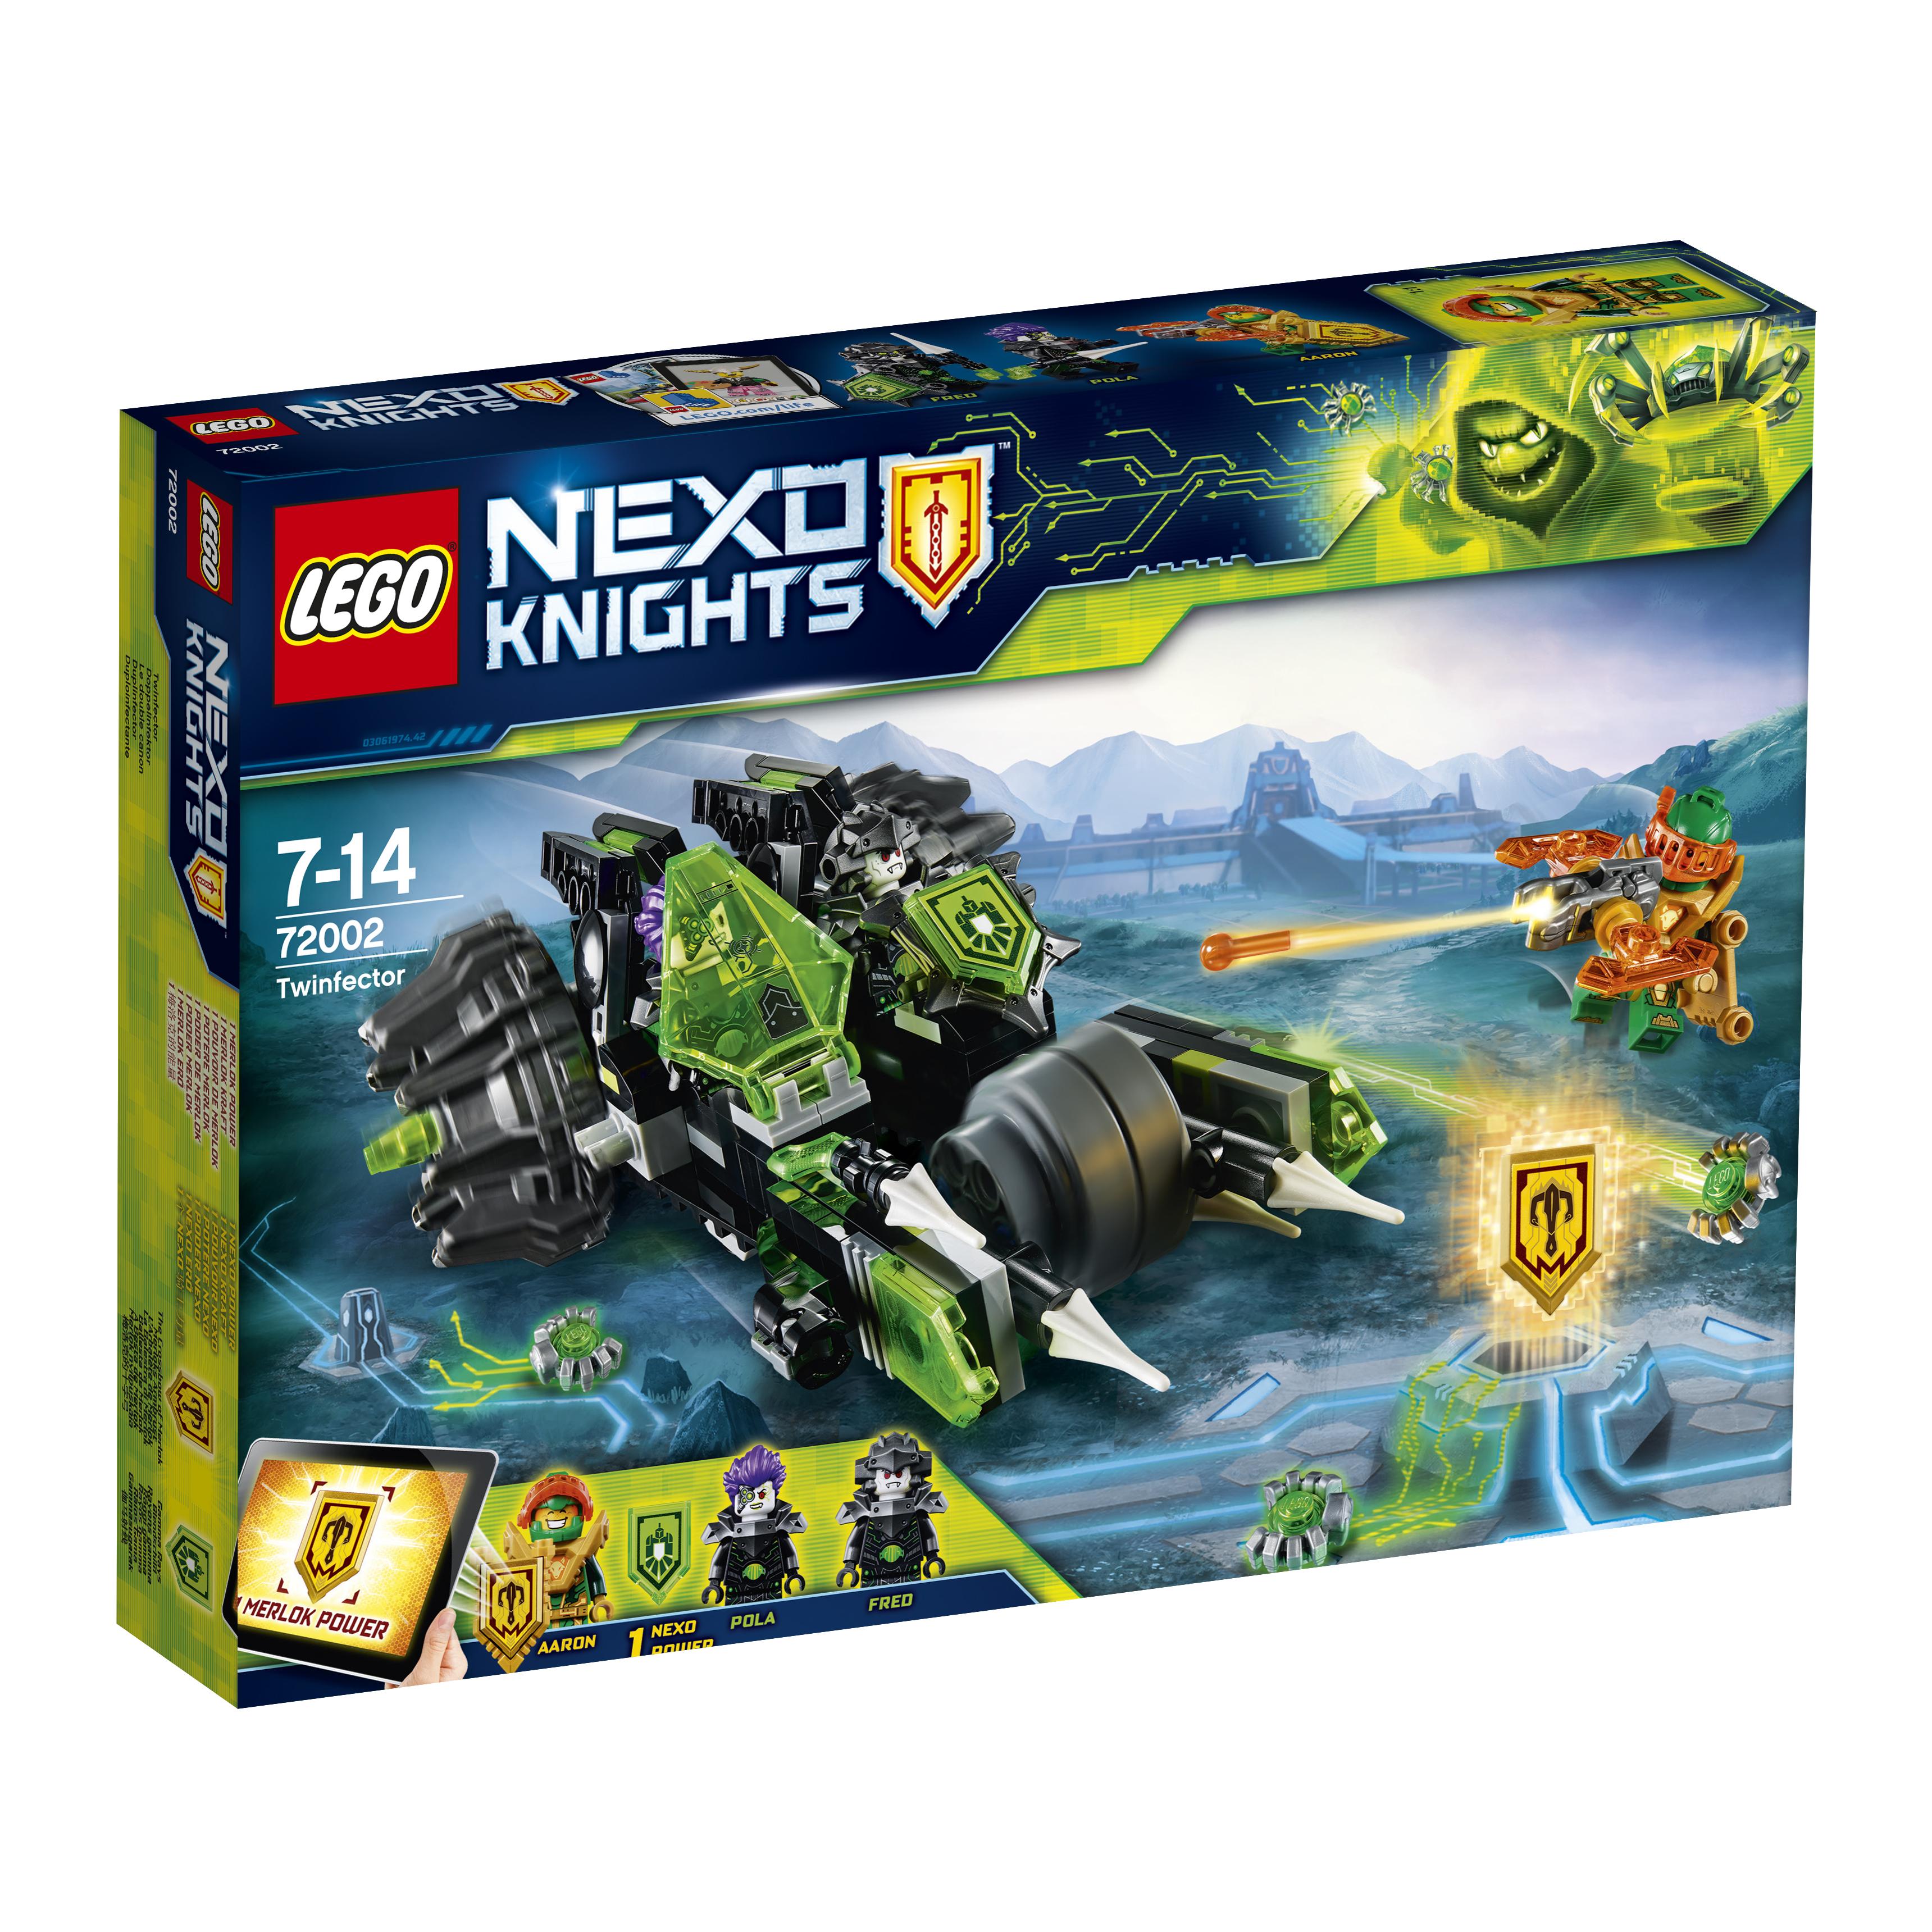 Конструктор LEGO Nexo Knights 72002 Боевая машина близнецов lepin nexo knights the fortrex combination marvel building blocks kits toys compatible legoe nexus